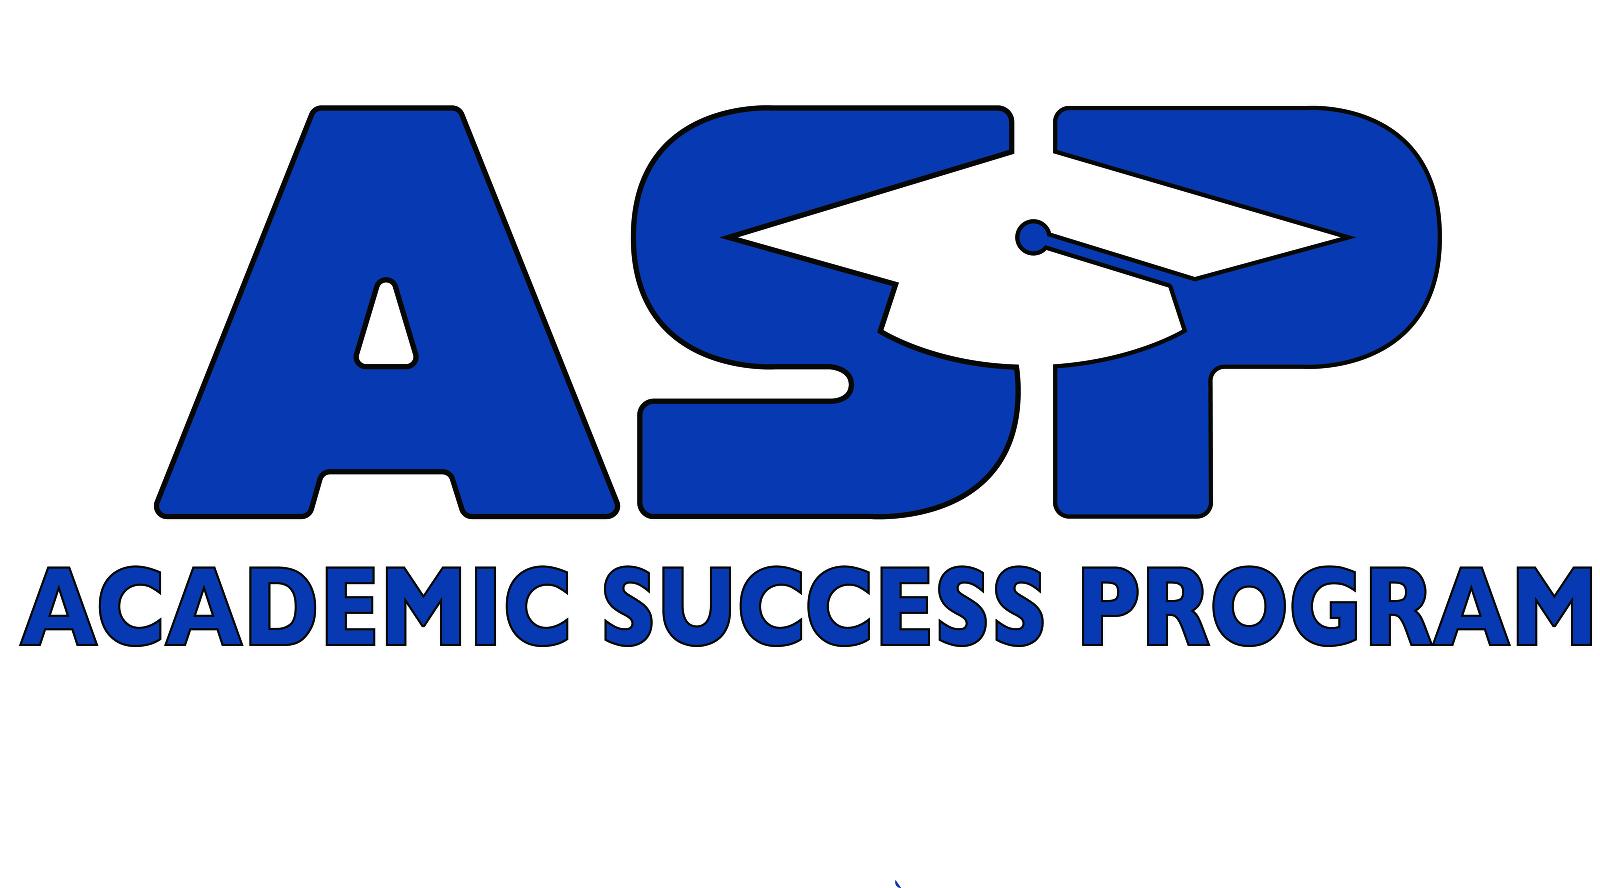 Academic Success Program logo